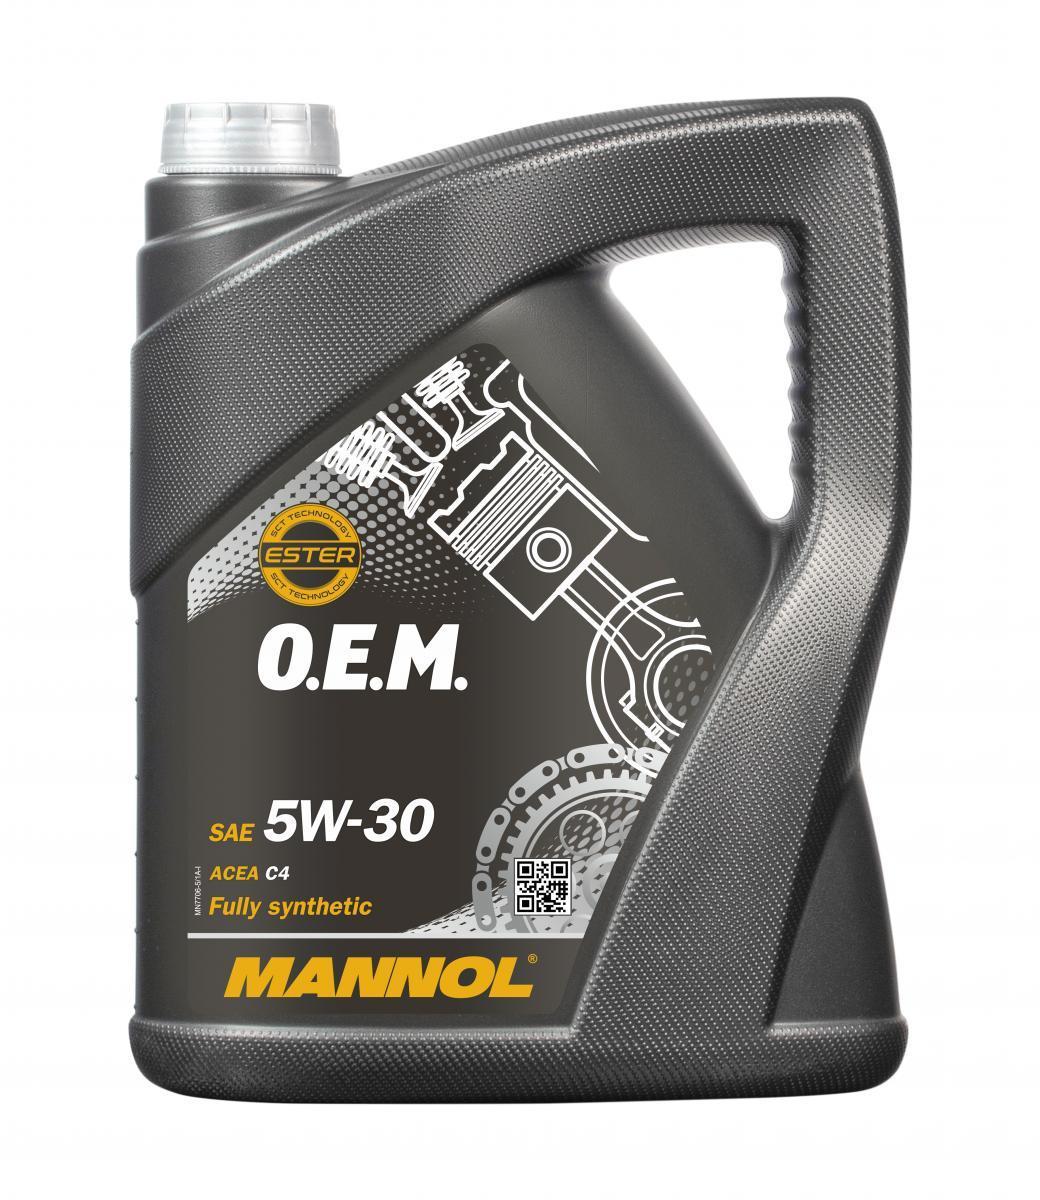 MANNOL O.E.M. MN7706-5 Motoröl